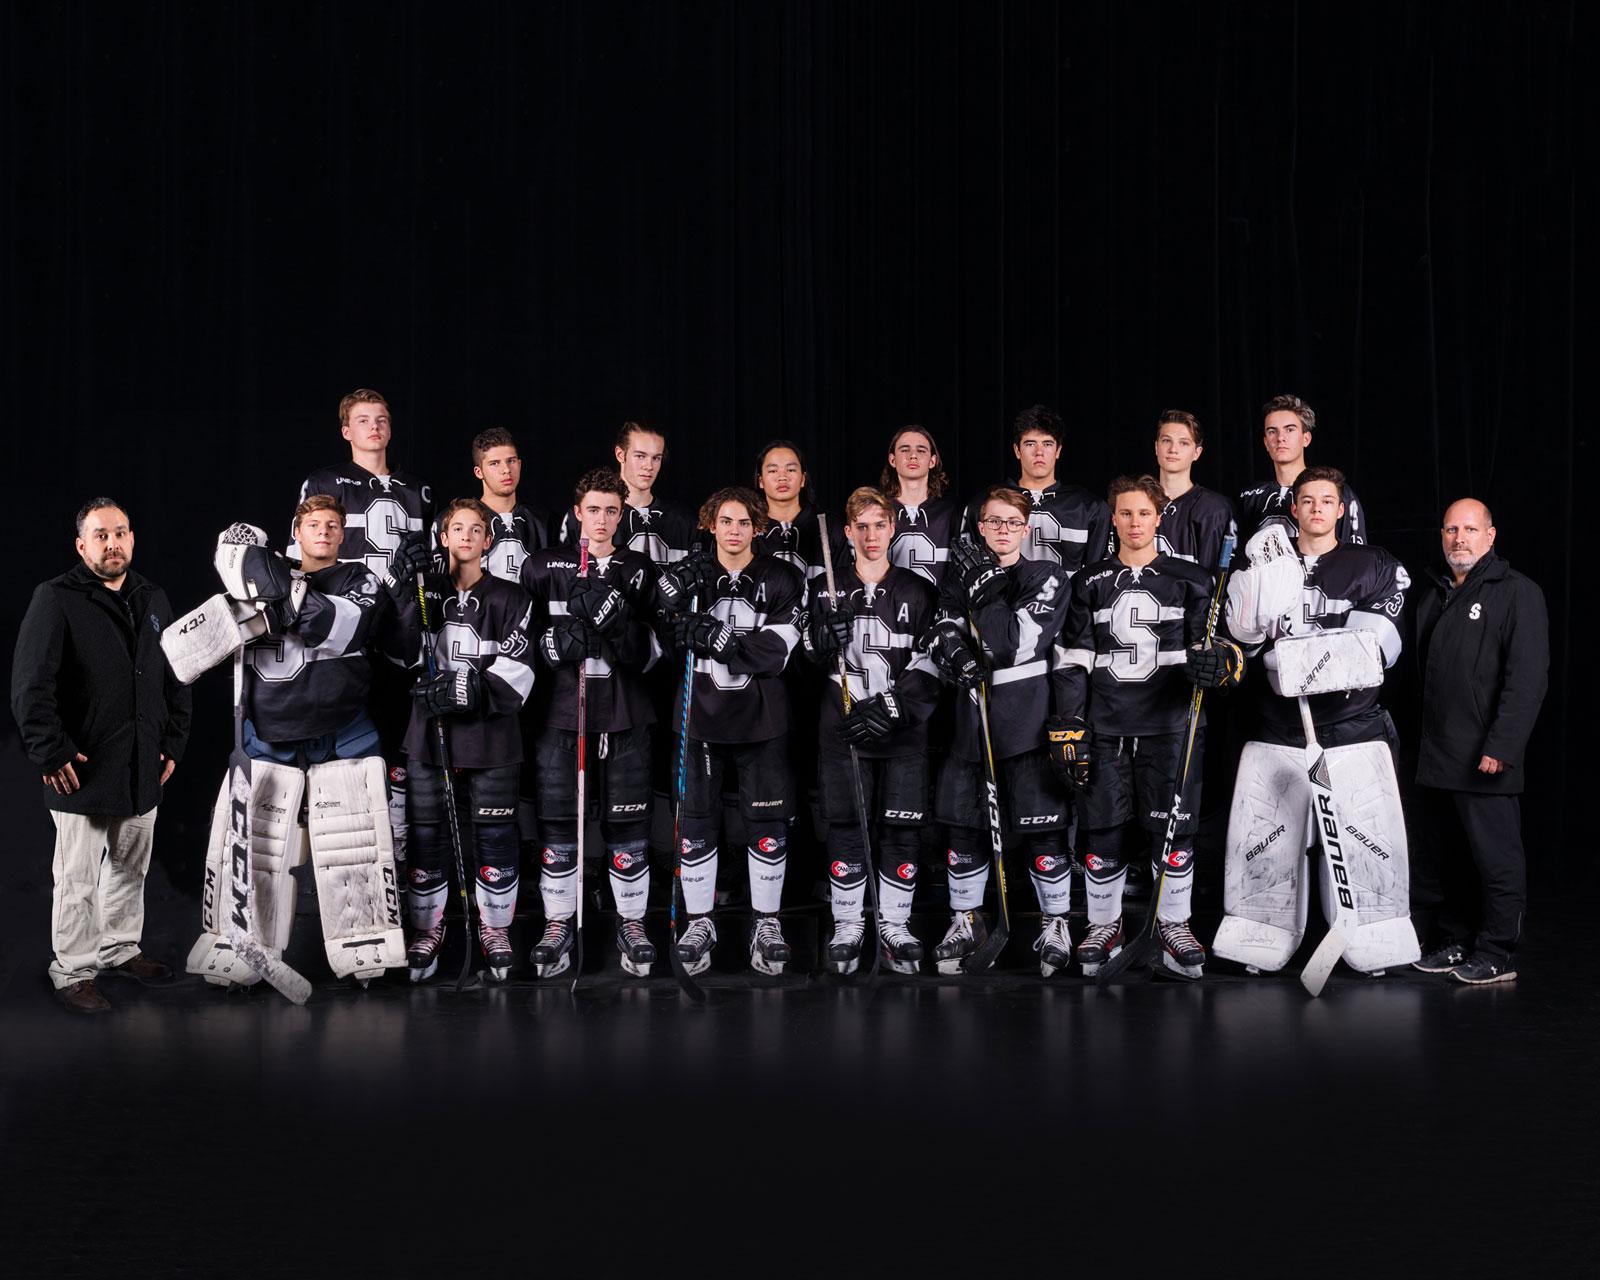 Hockey M17